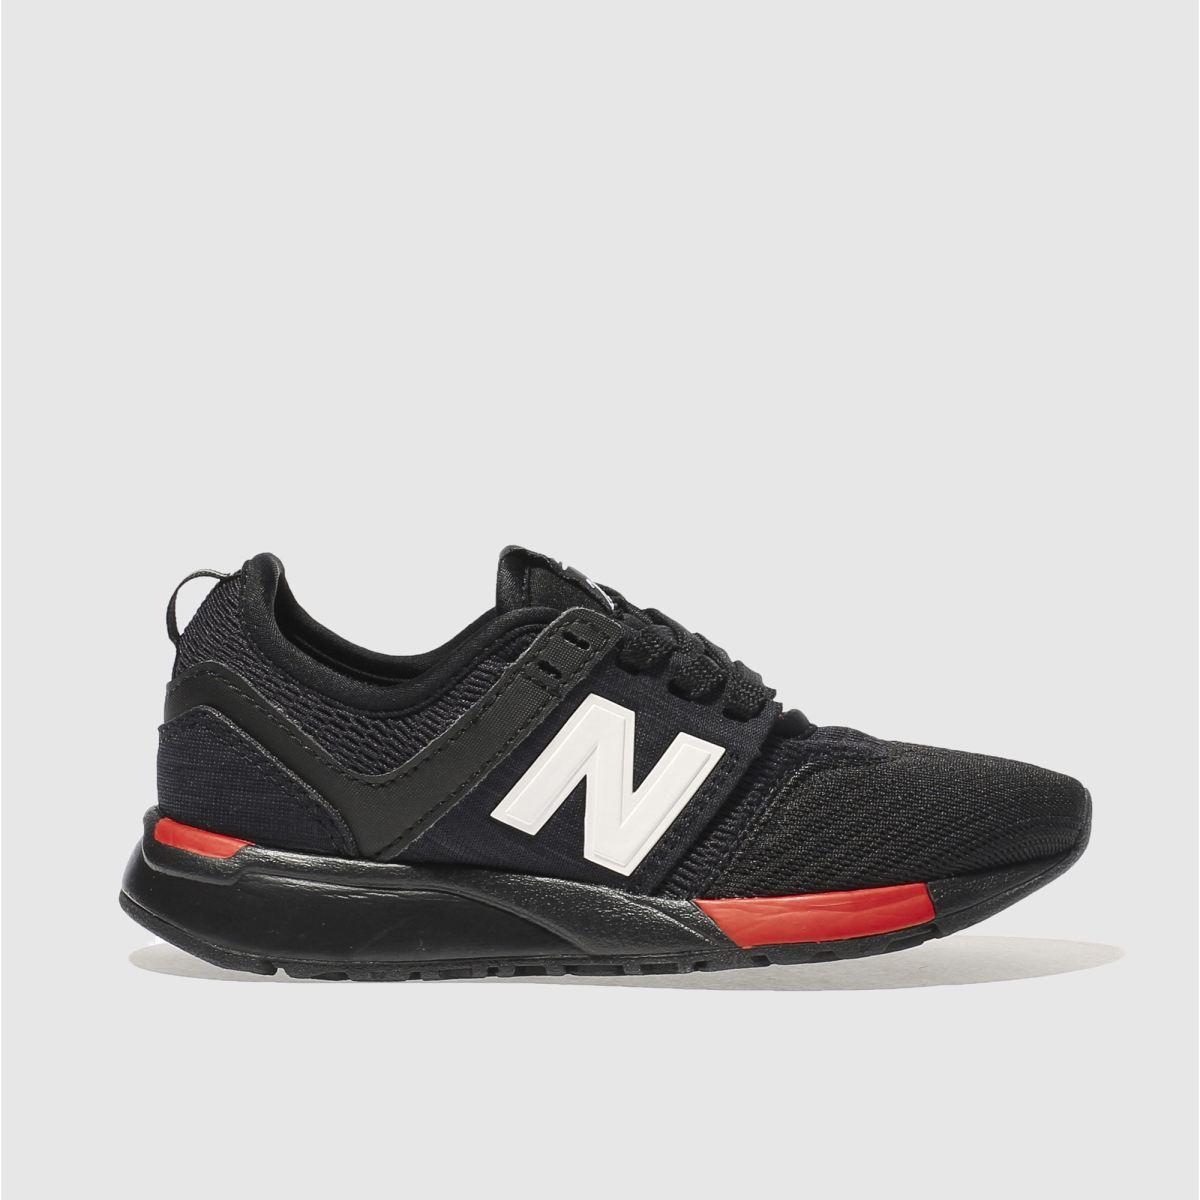 New Balance New Balance Black & Red 247 Junior Trainers